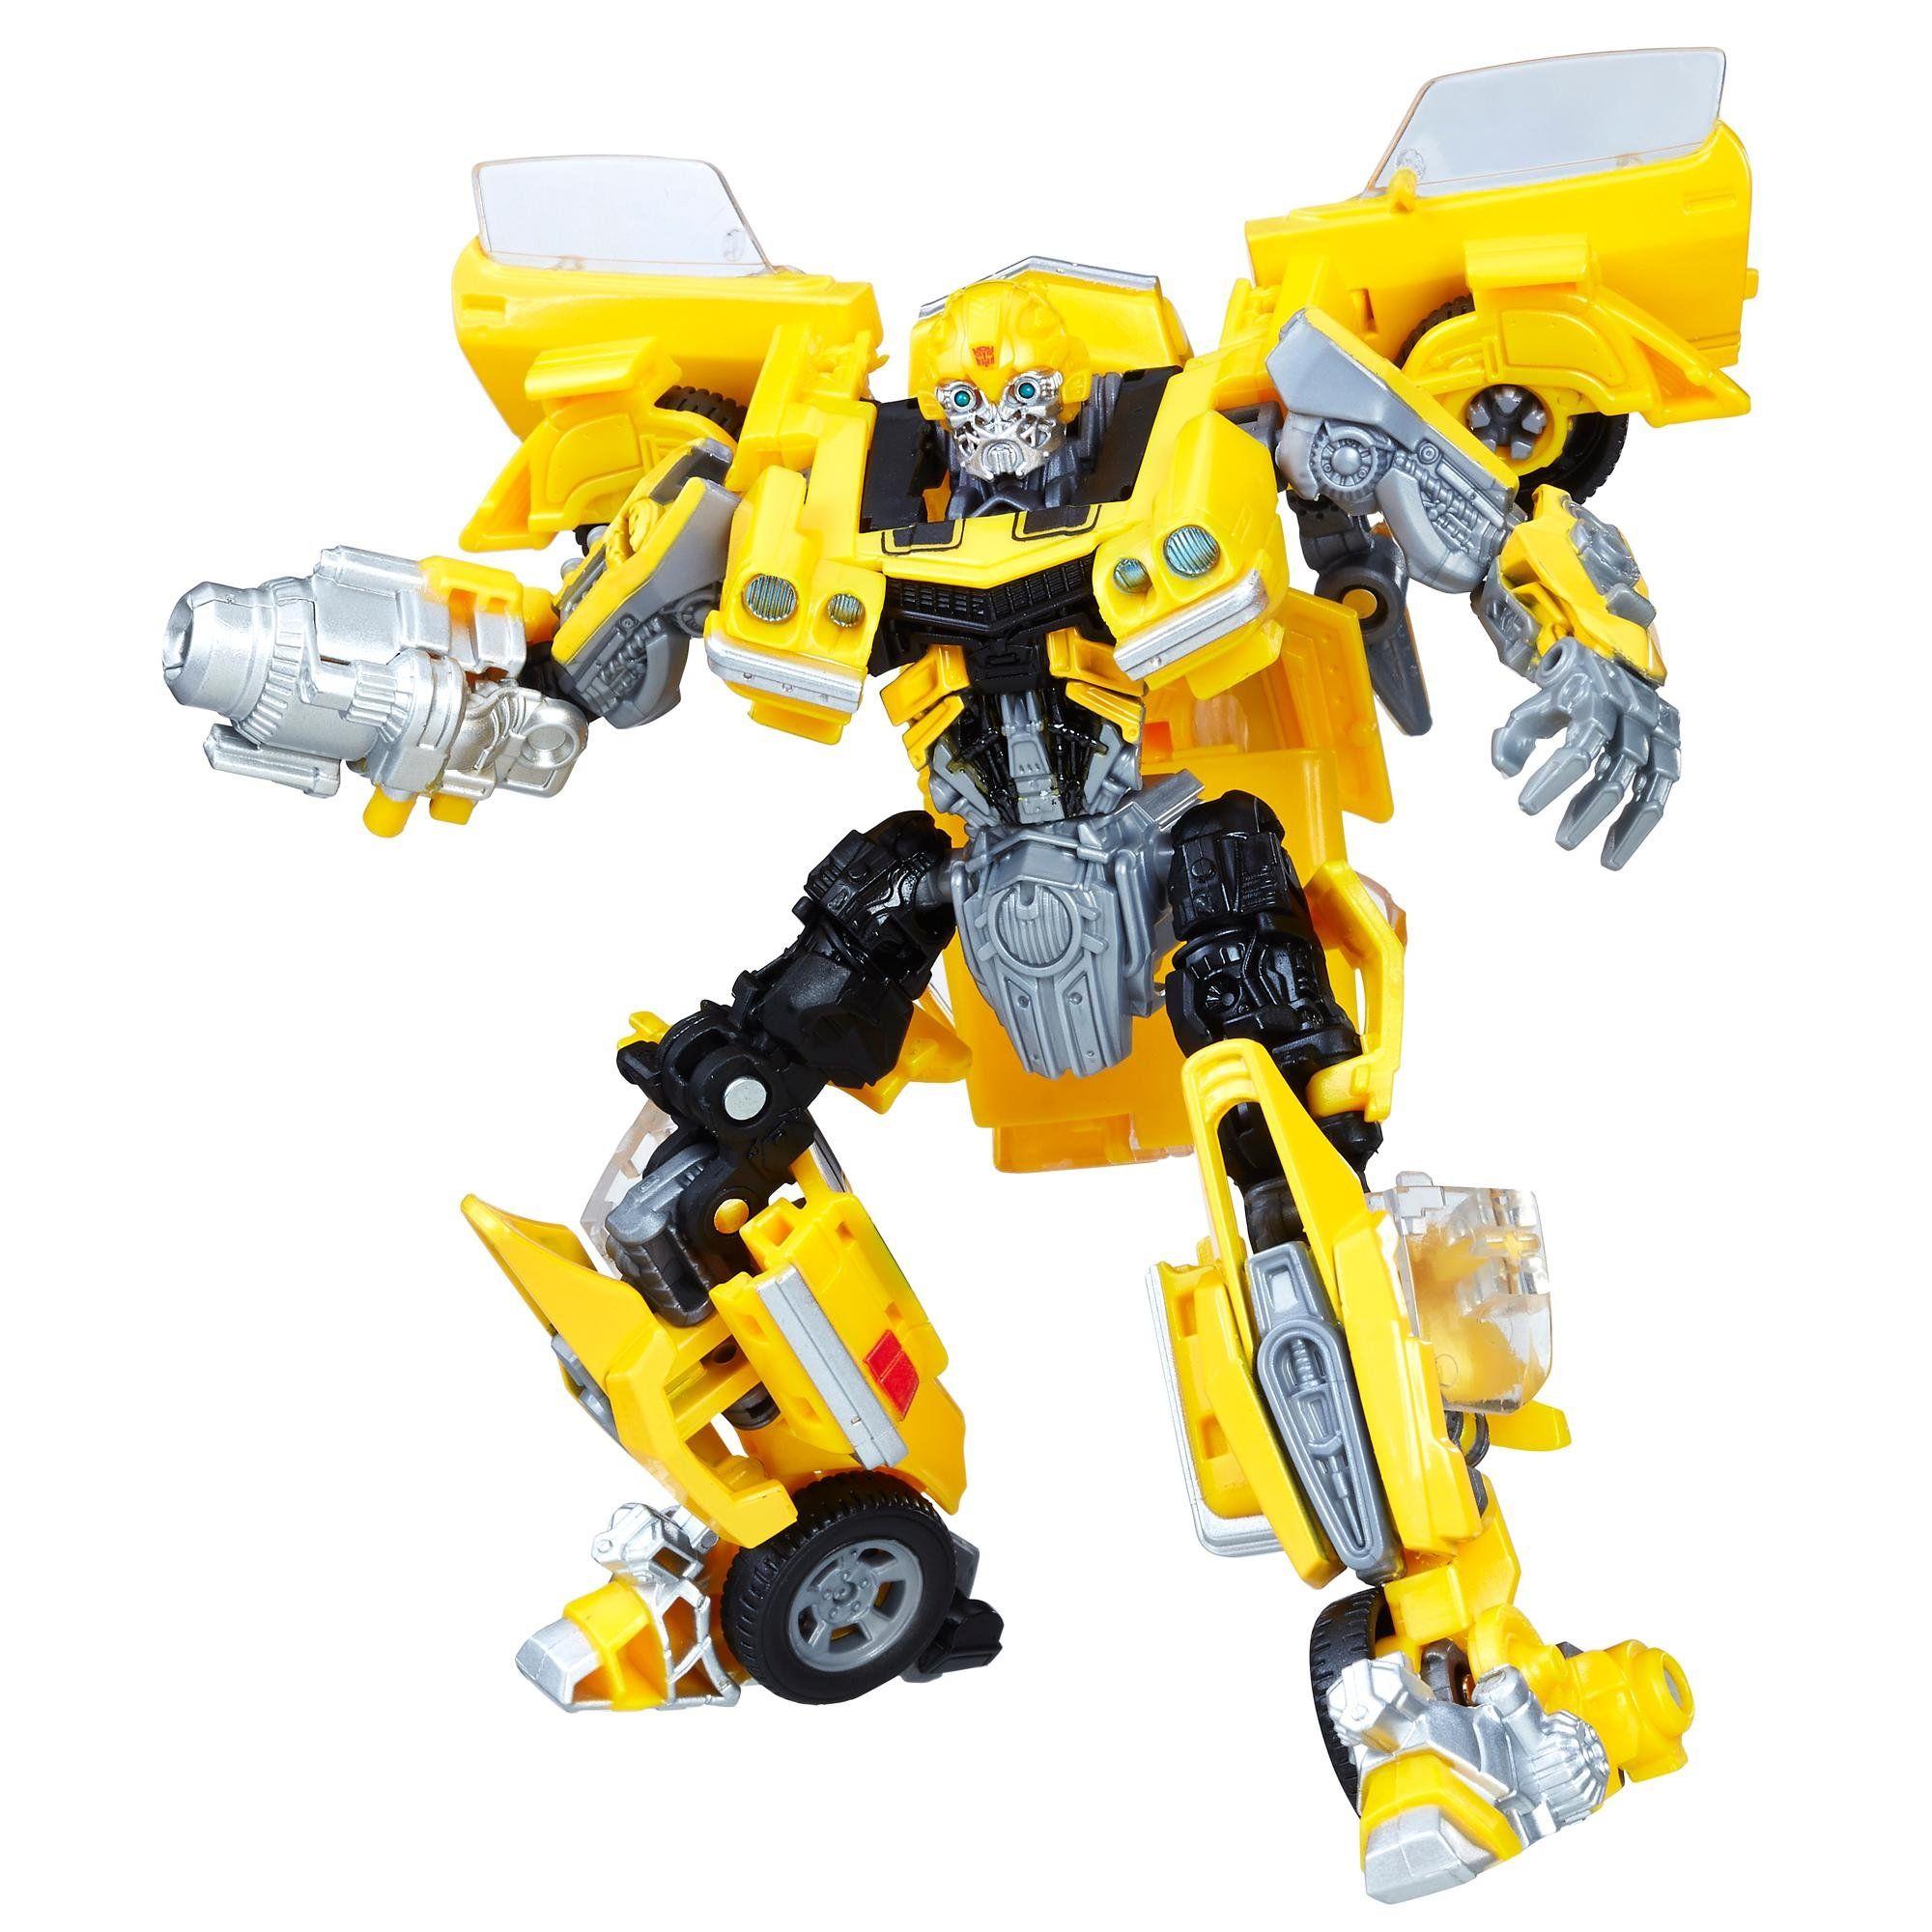 Boneco Bumblebee: Transformers - Hasbro